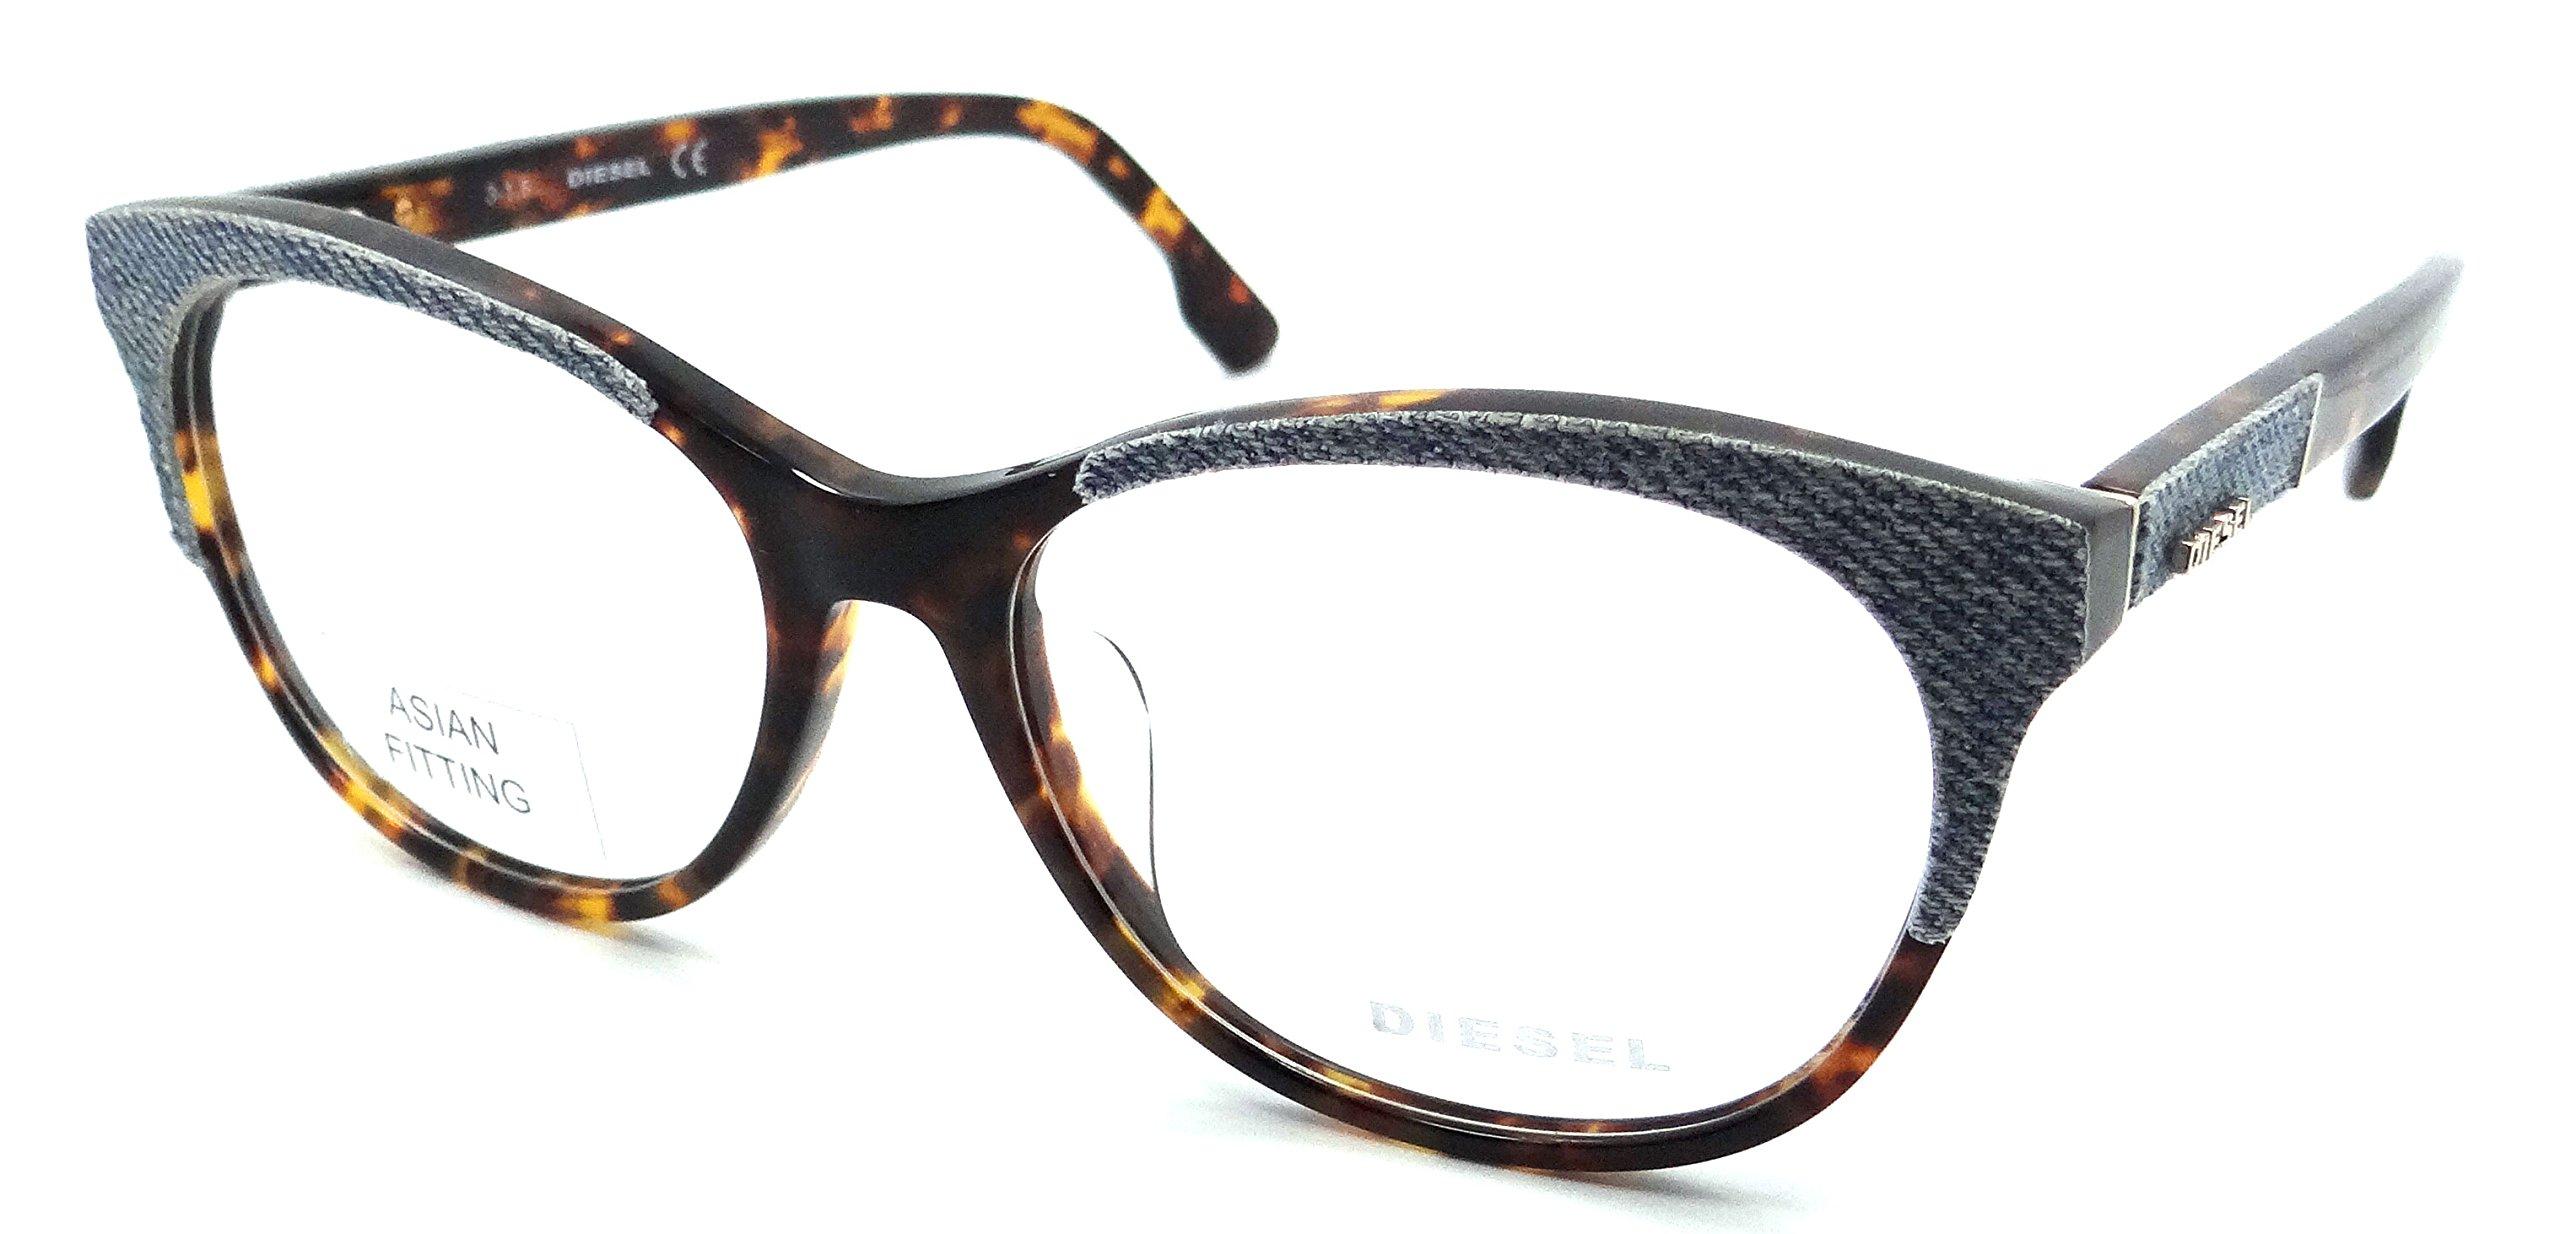 Diesel Rx Eyeglasses Frames DL5155-F 053 56-15-145 Blue Denim /Havana Asian Fit